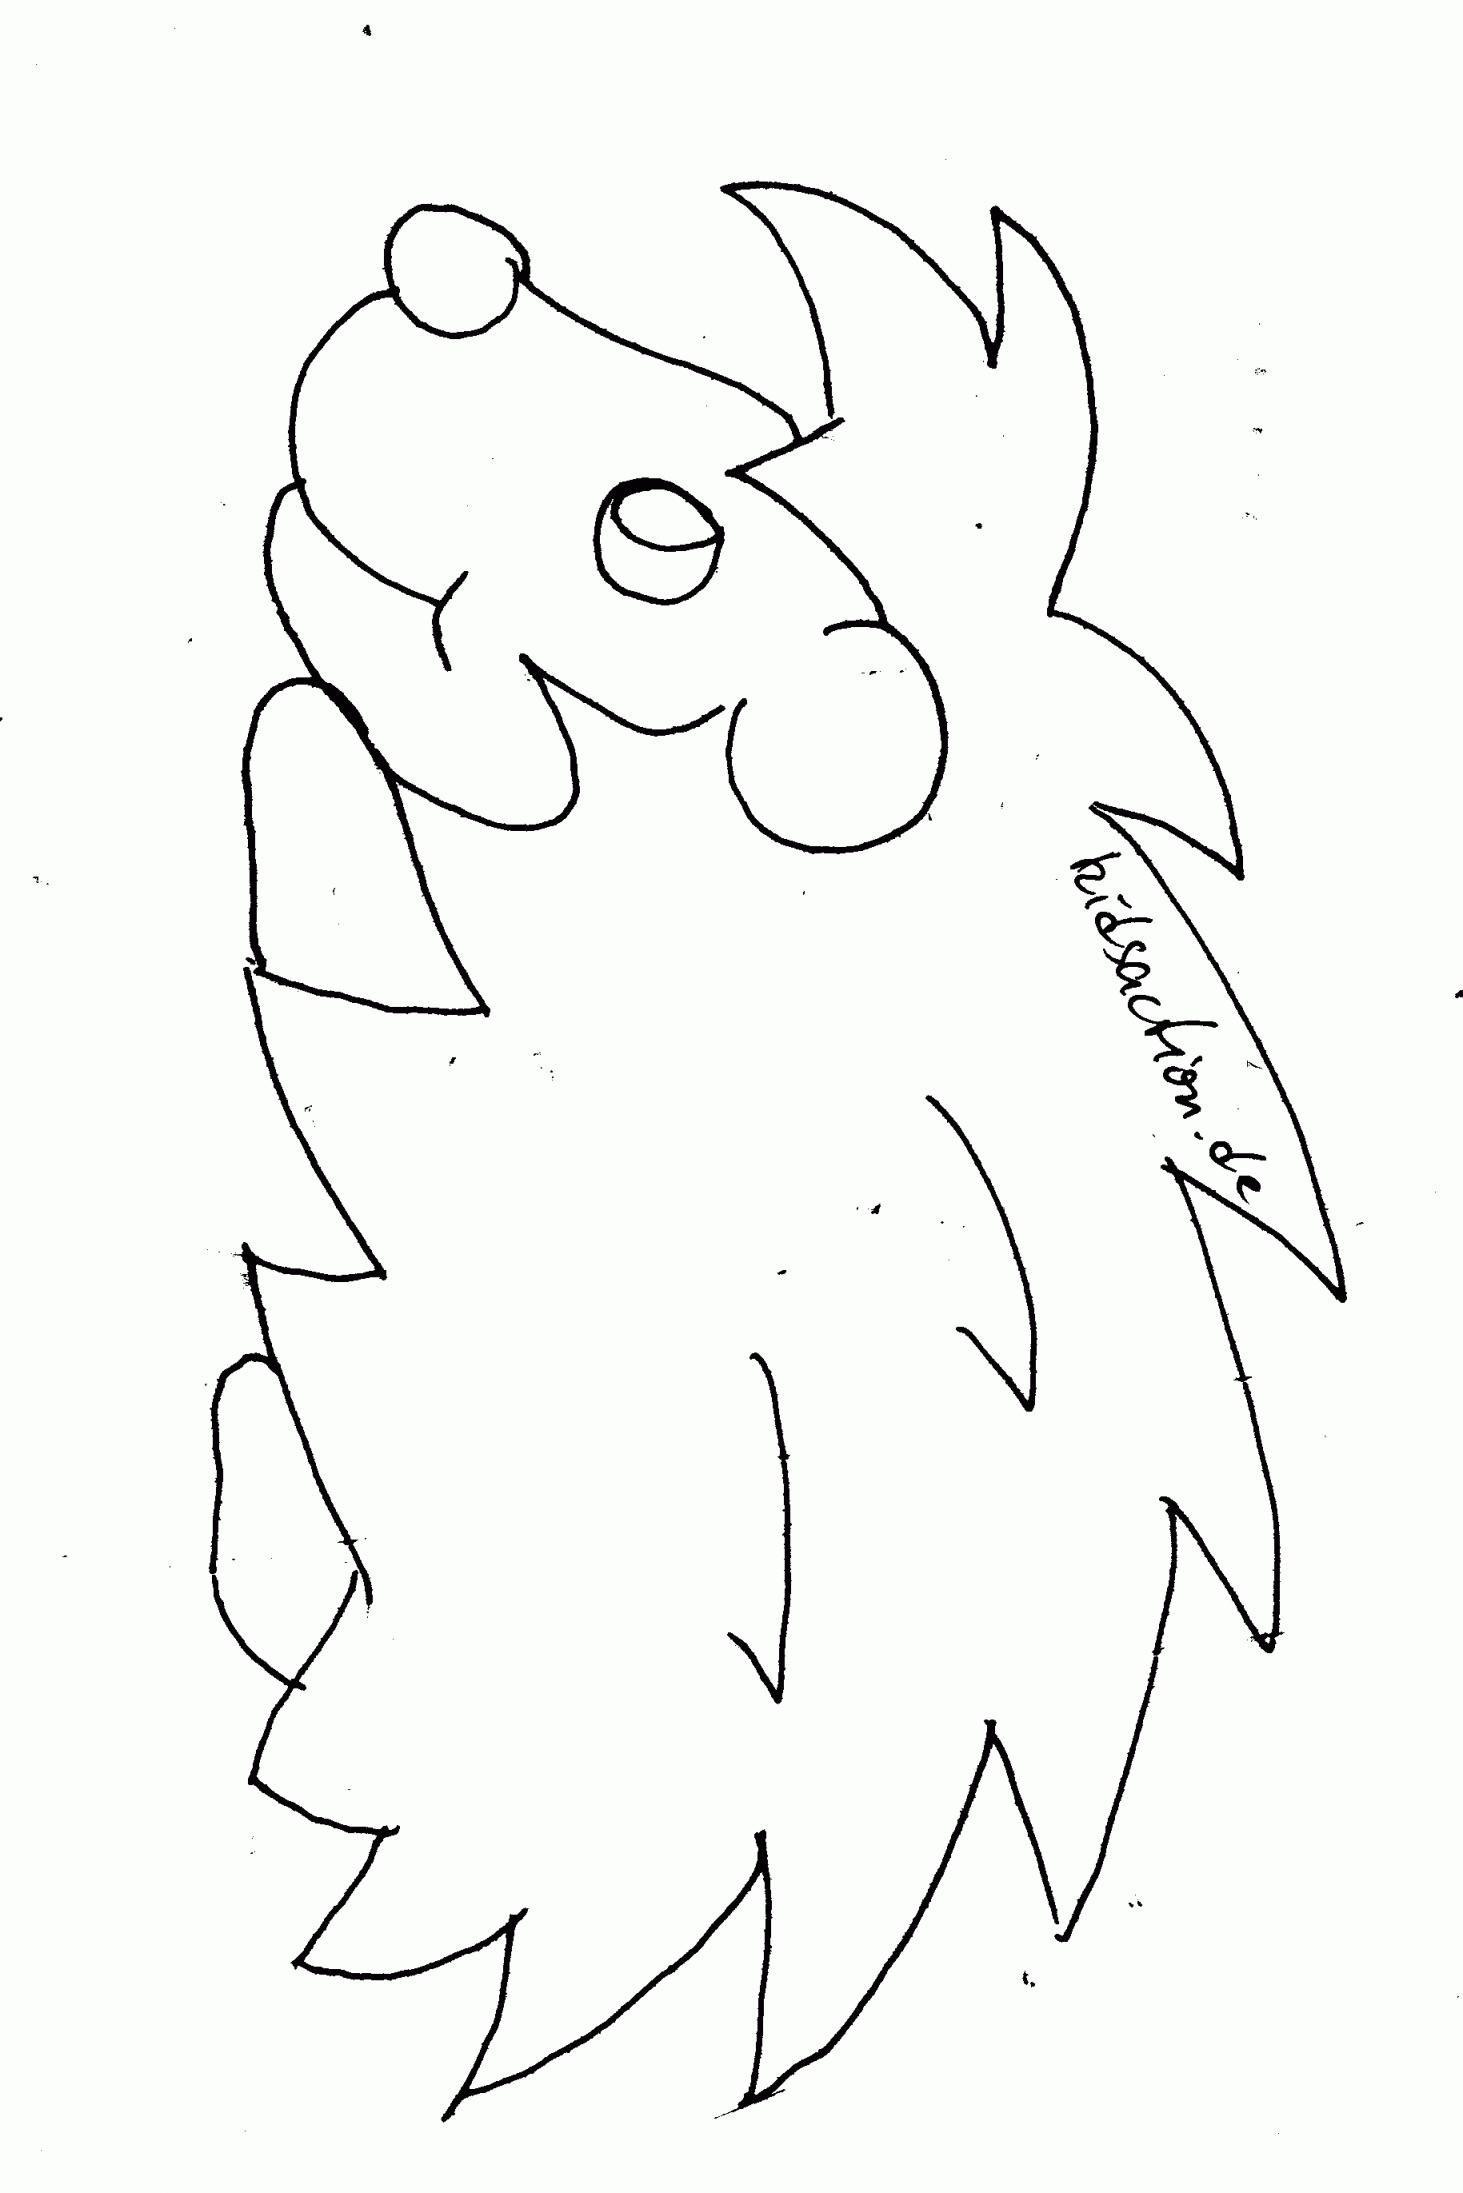 Ninjago Jay Ausmalbilder Frisch Malvorlagen Igel Elegant Igel Grundschule 0d Archives Uploadertalk Sammlung